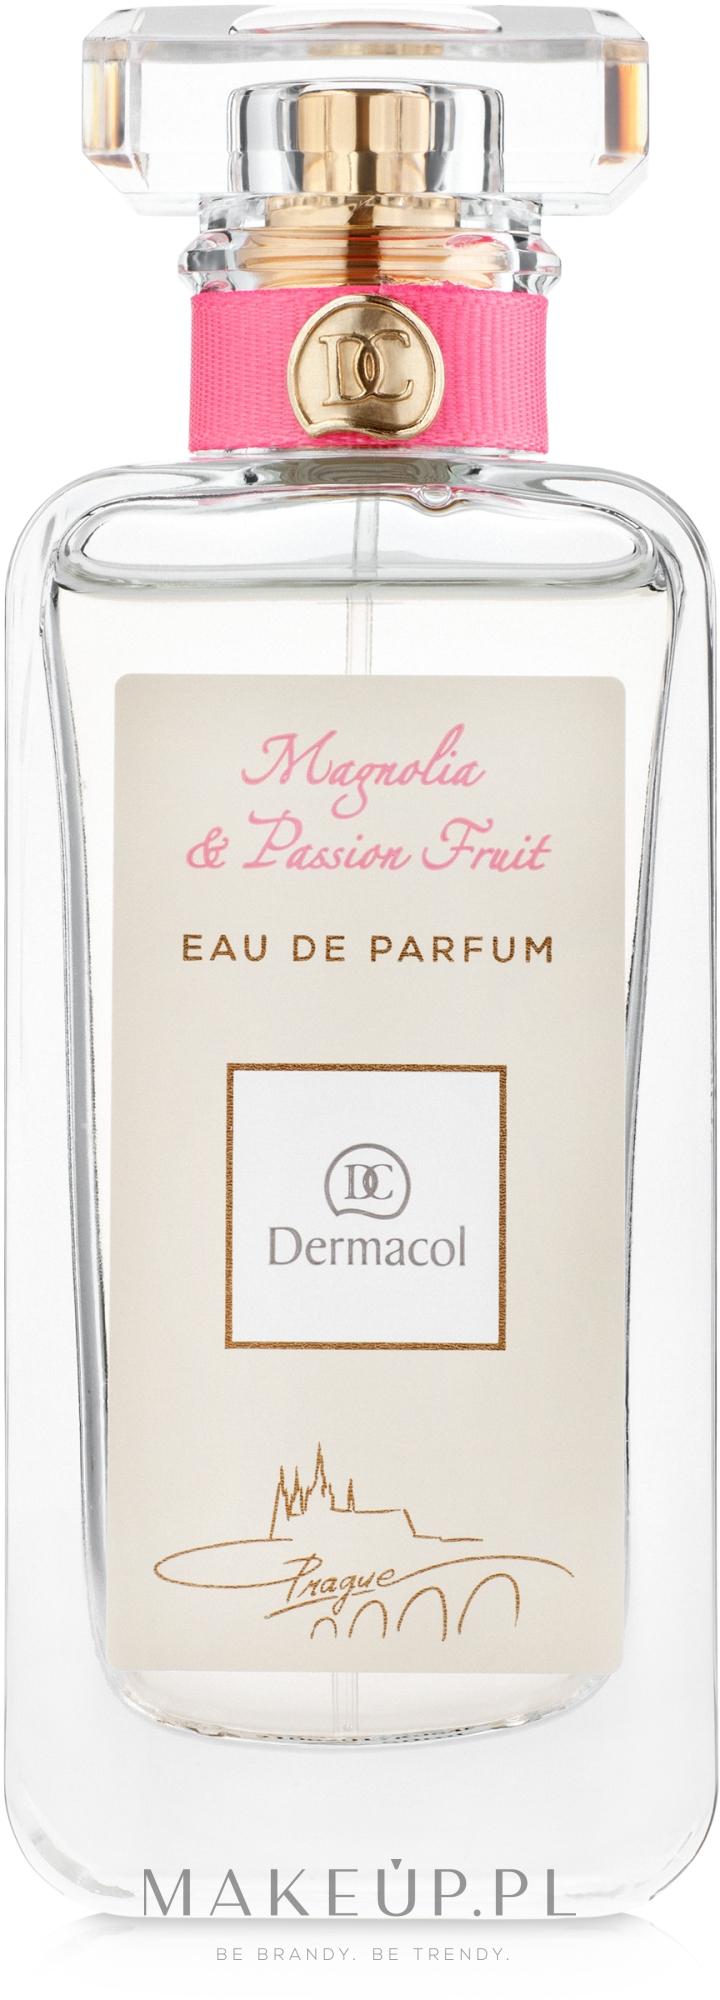 dermacol magnolia & passion fruit